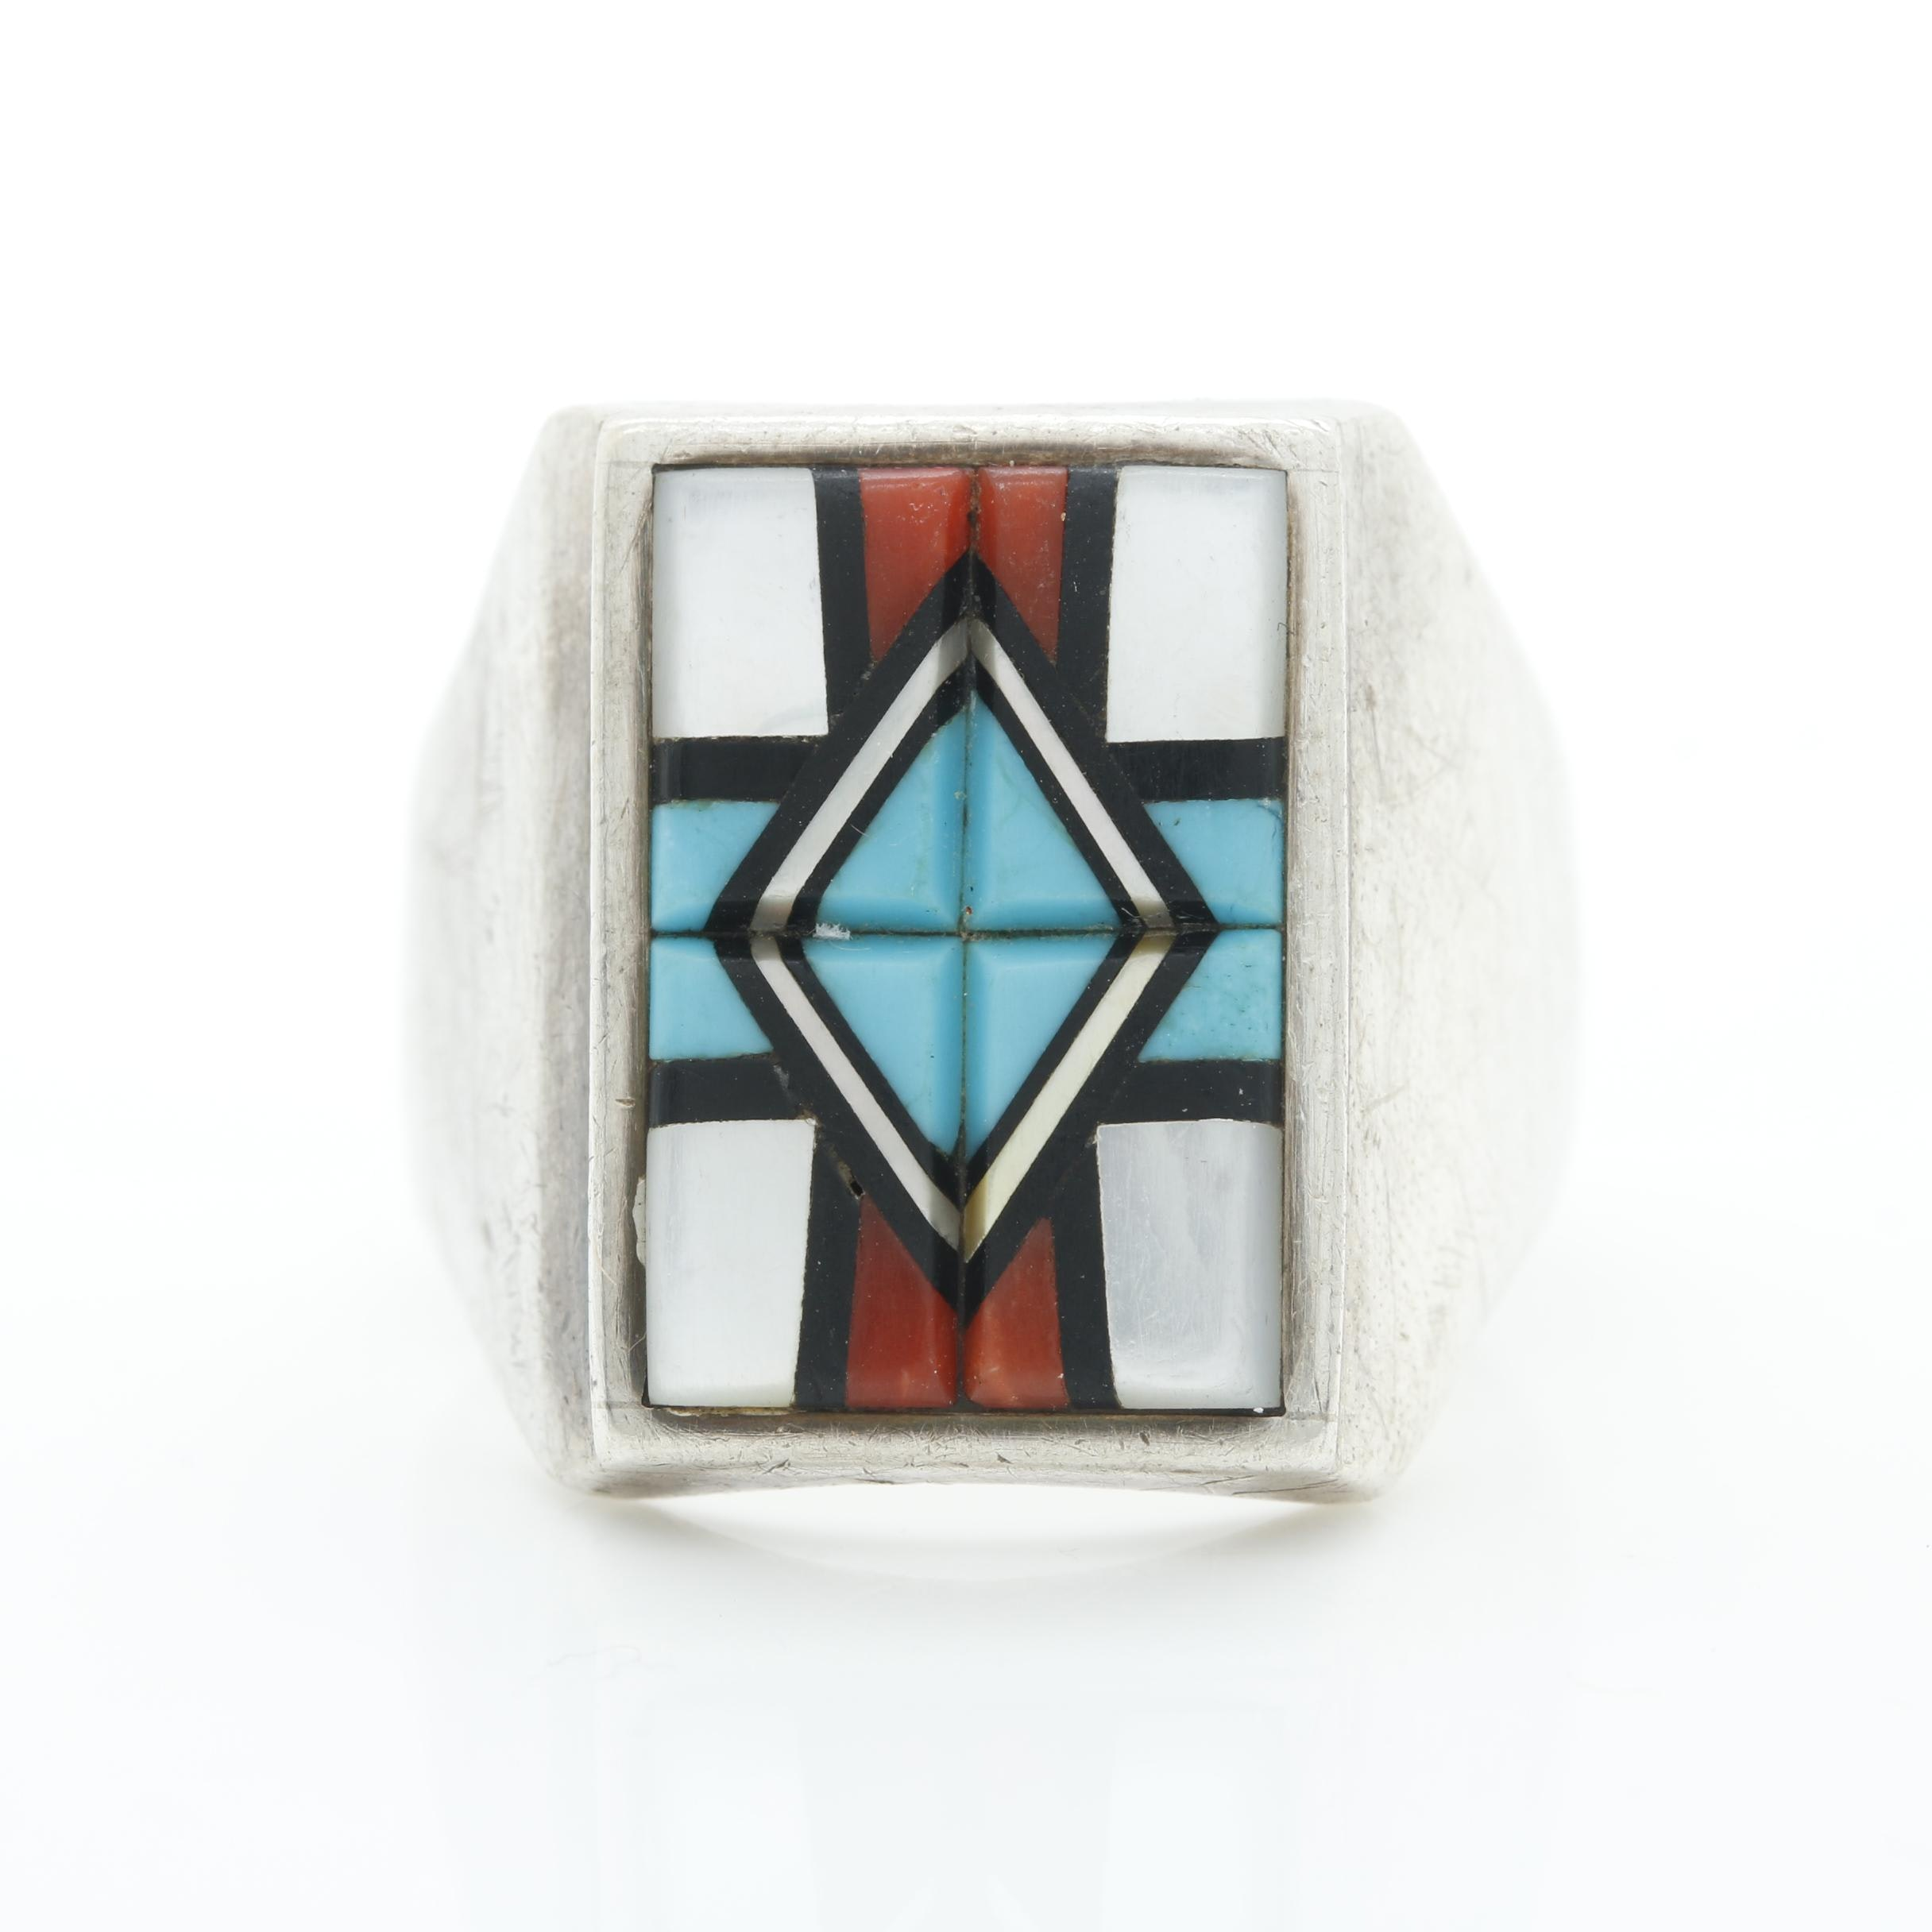 Southwestern Style Sterling Silver Gemstone Inlay Ring